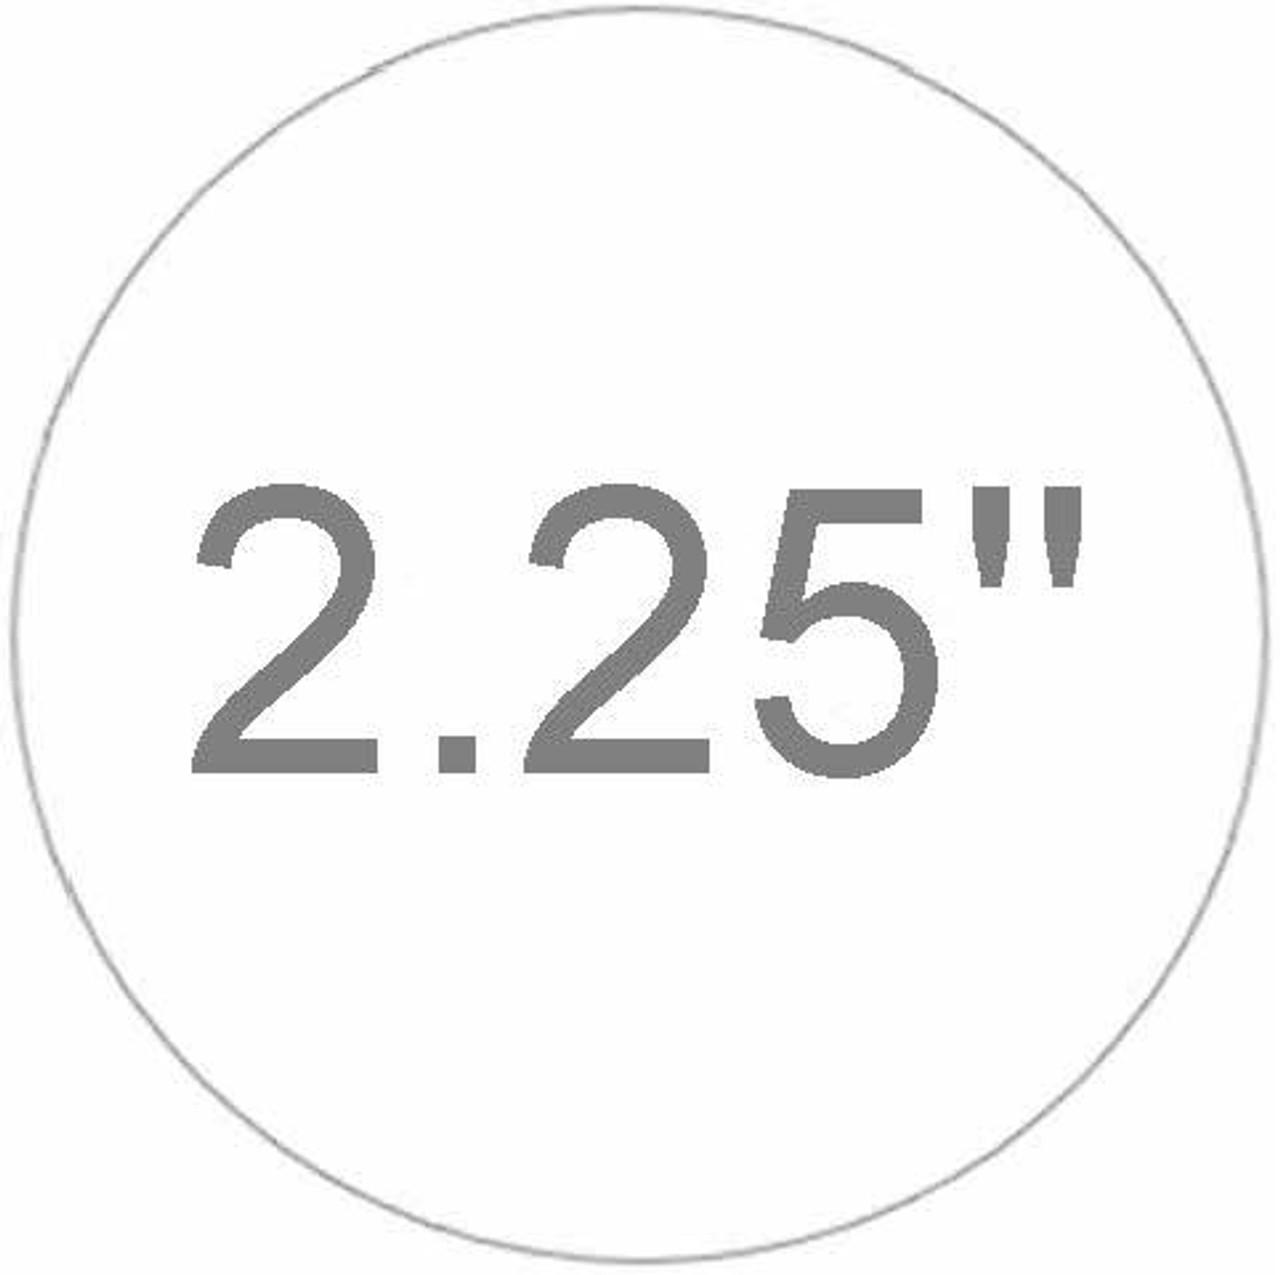 "2.25"" Probe Rod System"